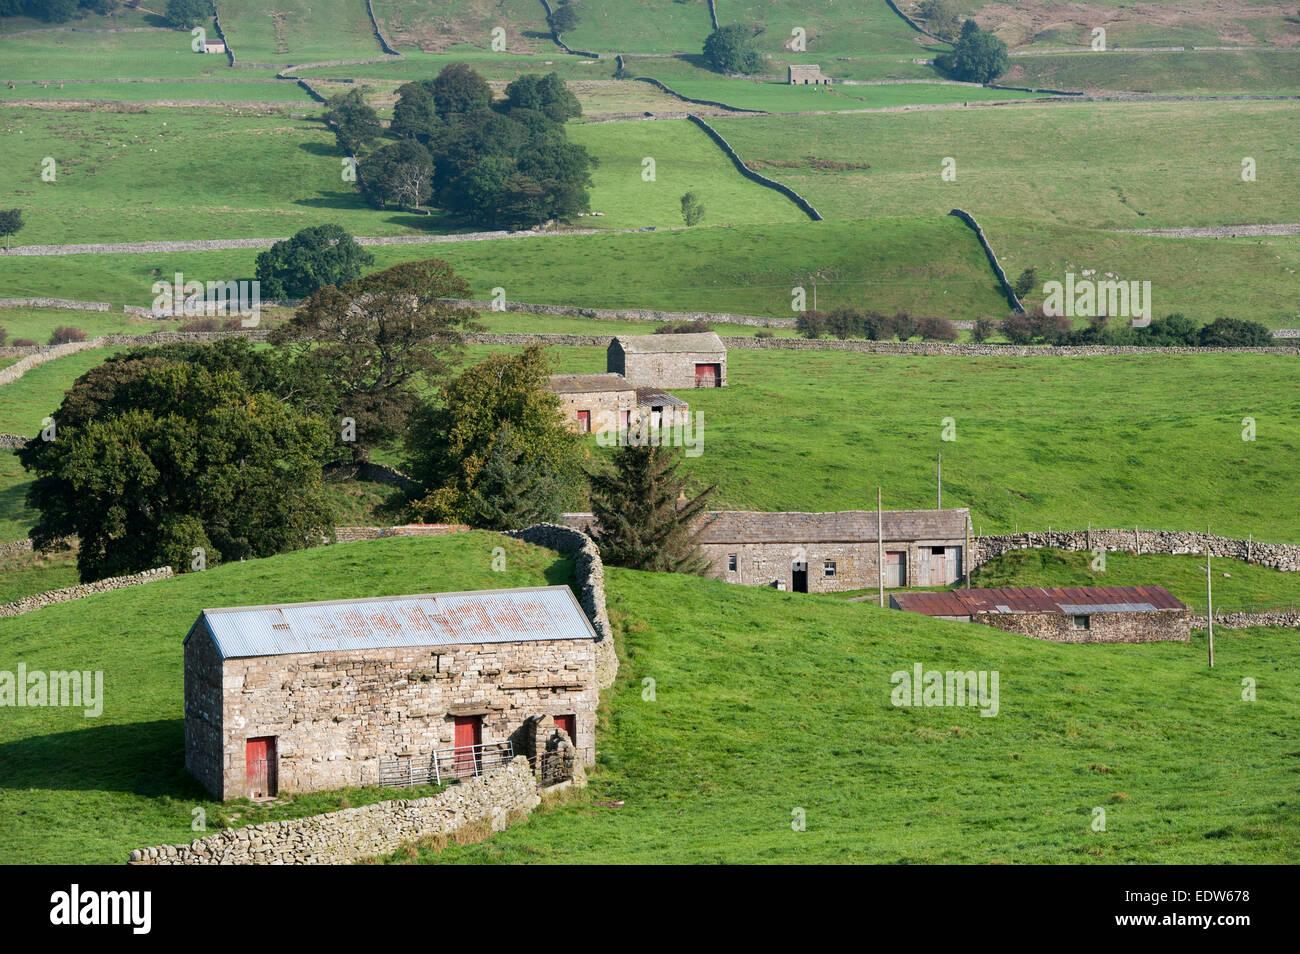 Traditional stone barns in Wensleydale, Yorkshire, UK. - Stock Image